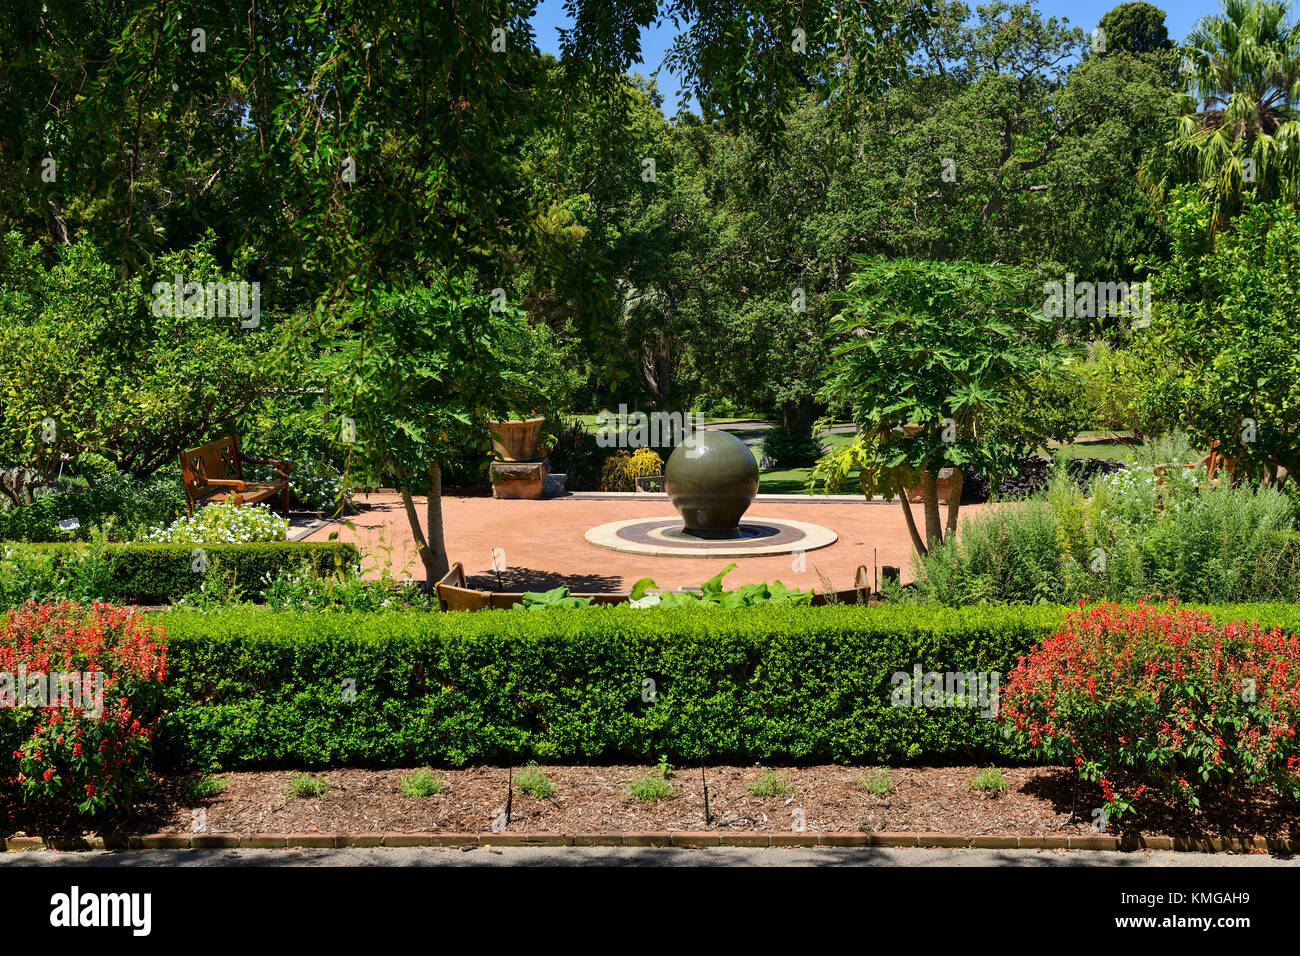 Rose Garden in Royal Botanic Garden Sydney, New South Wales, Australia - Stock Image